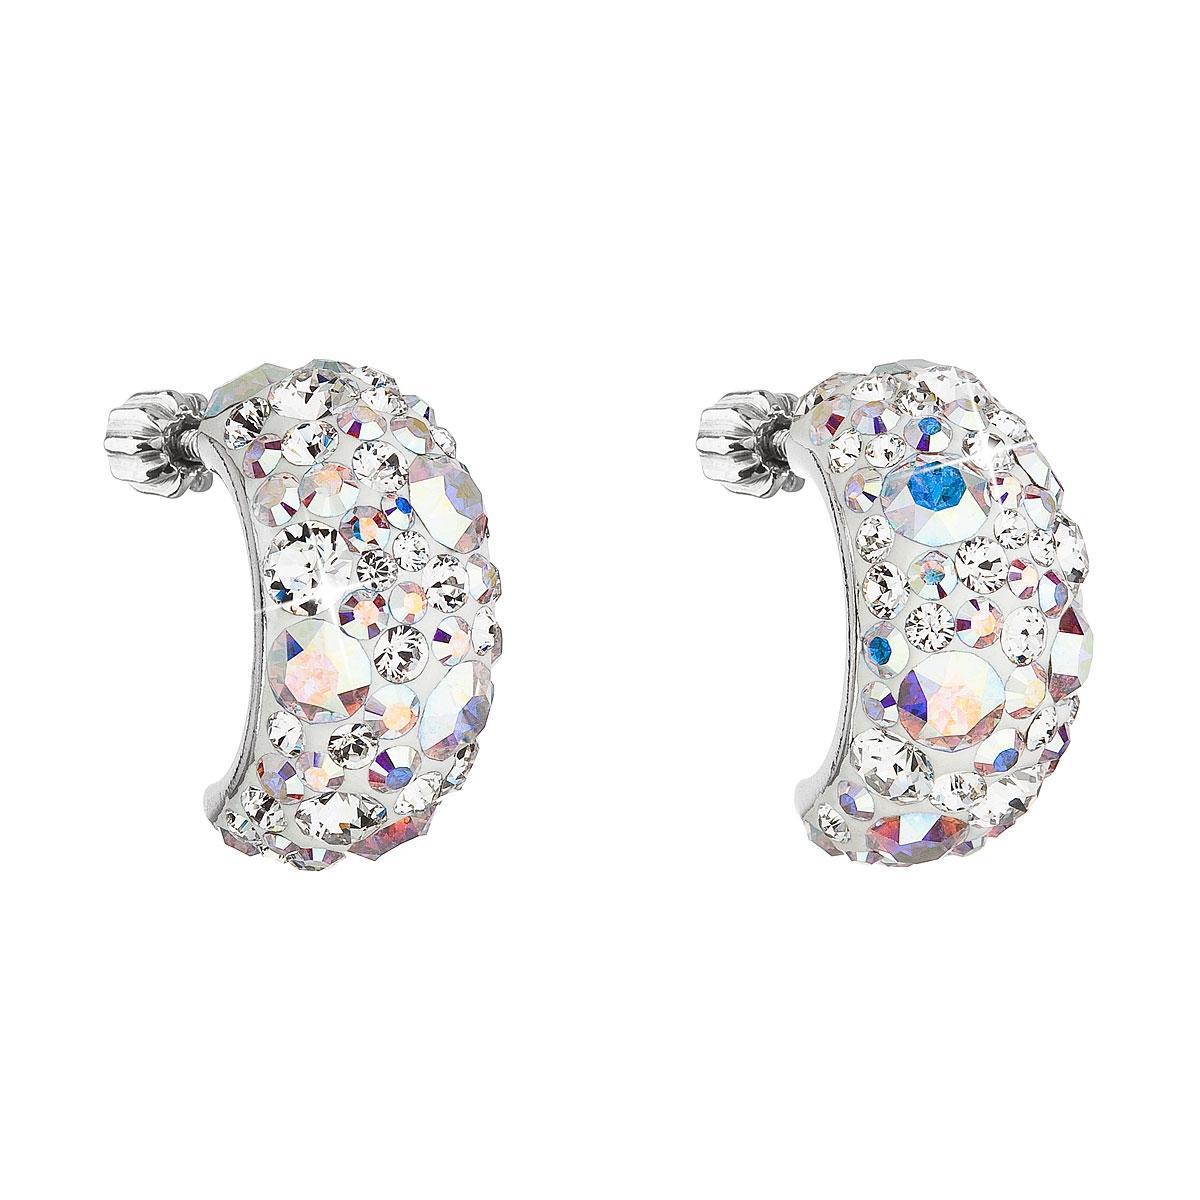 Stříbrné šroubovací náušnice s krystaly Crystals from Swarovski® AB EG2002-AB